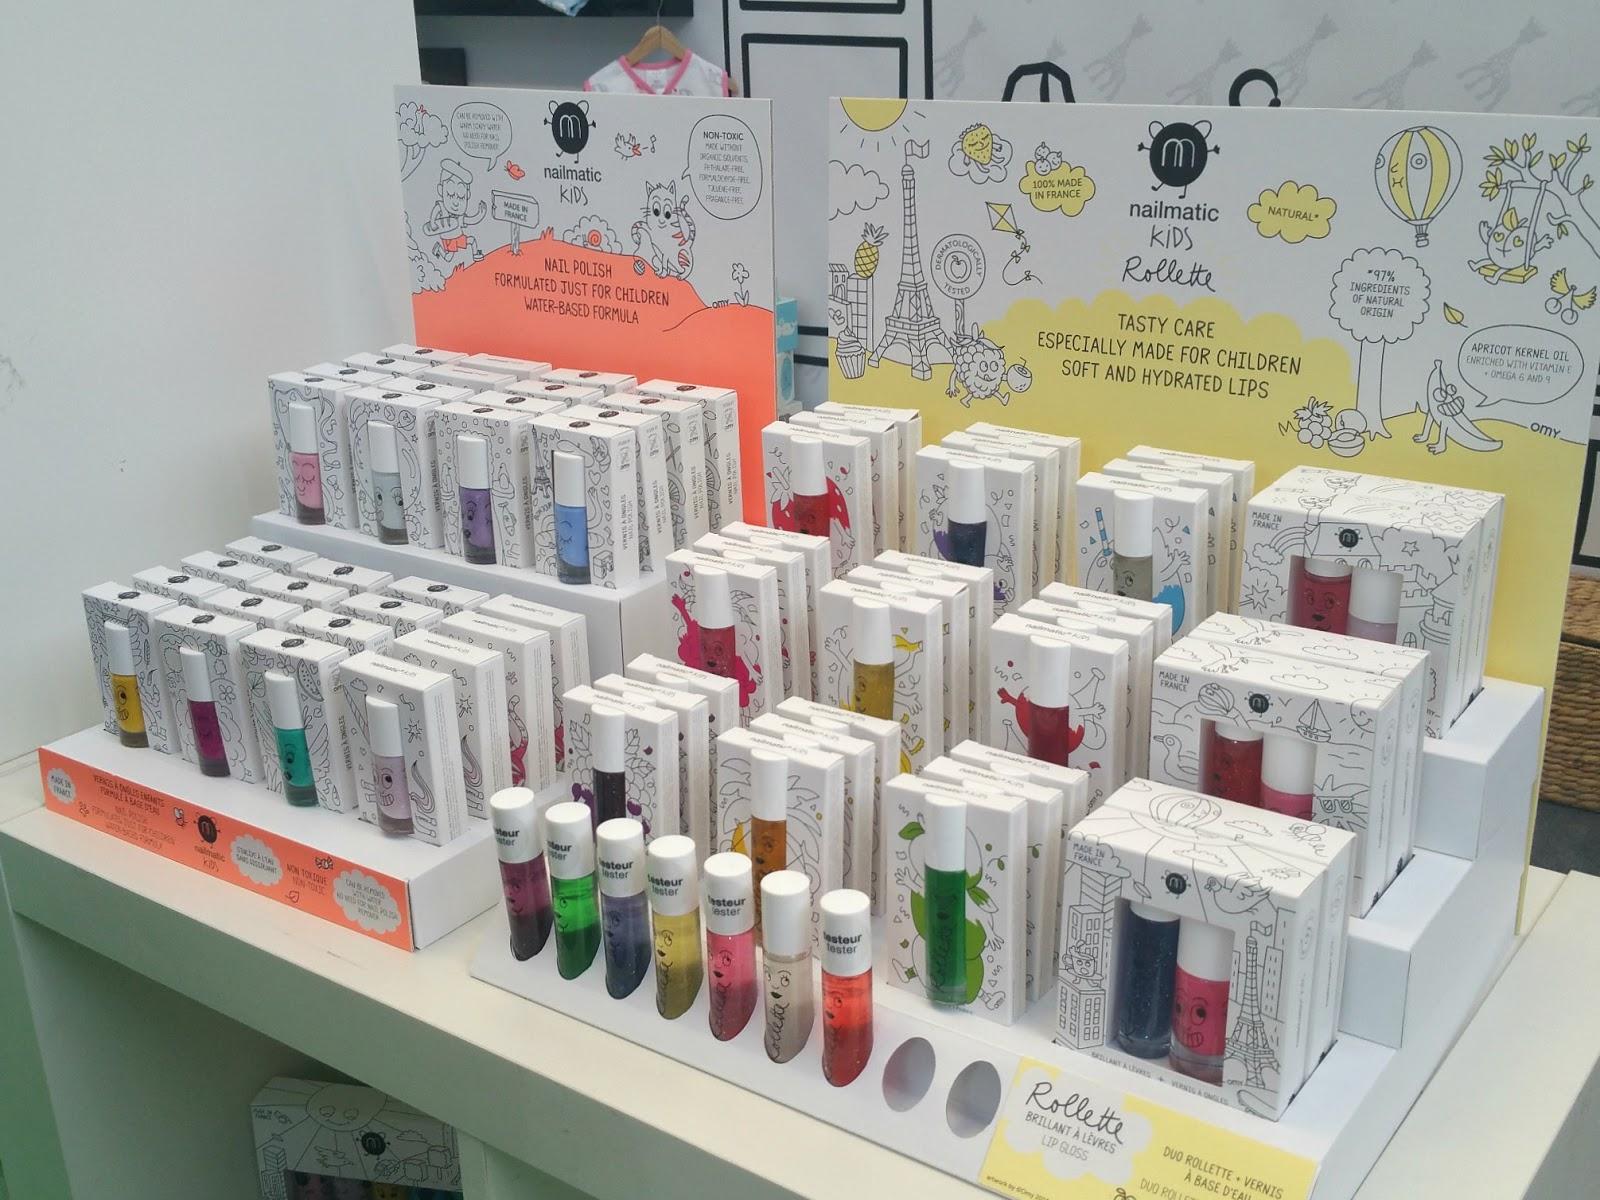 Nailmatic Kids, Nailmatic Kids Rolette, Nail polish varnish and lip gloss made for kids